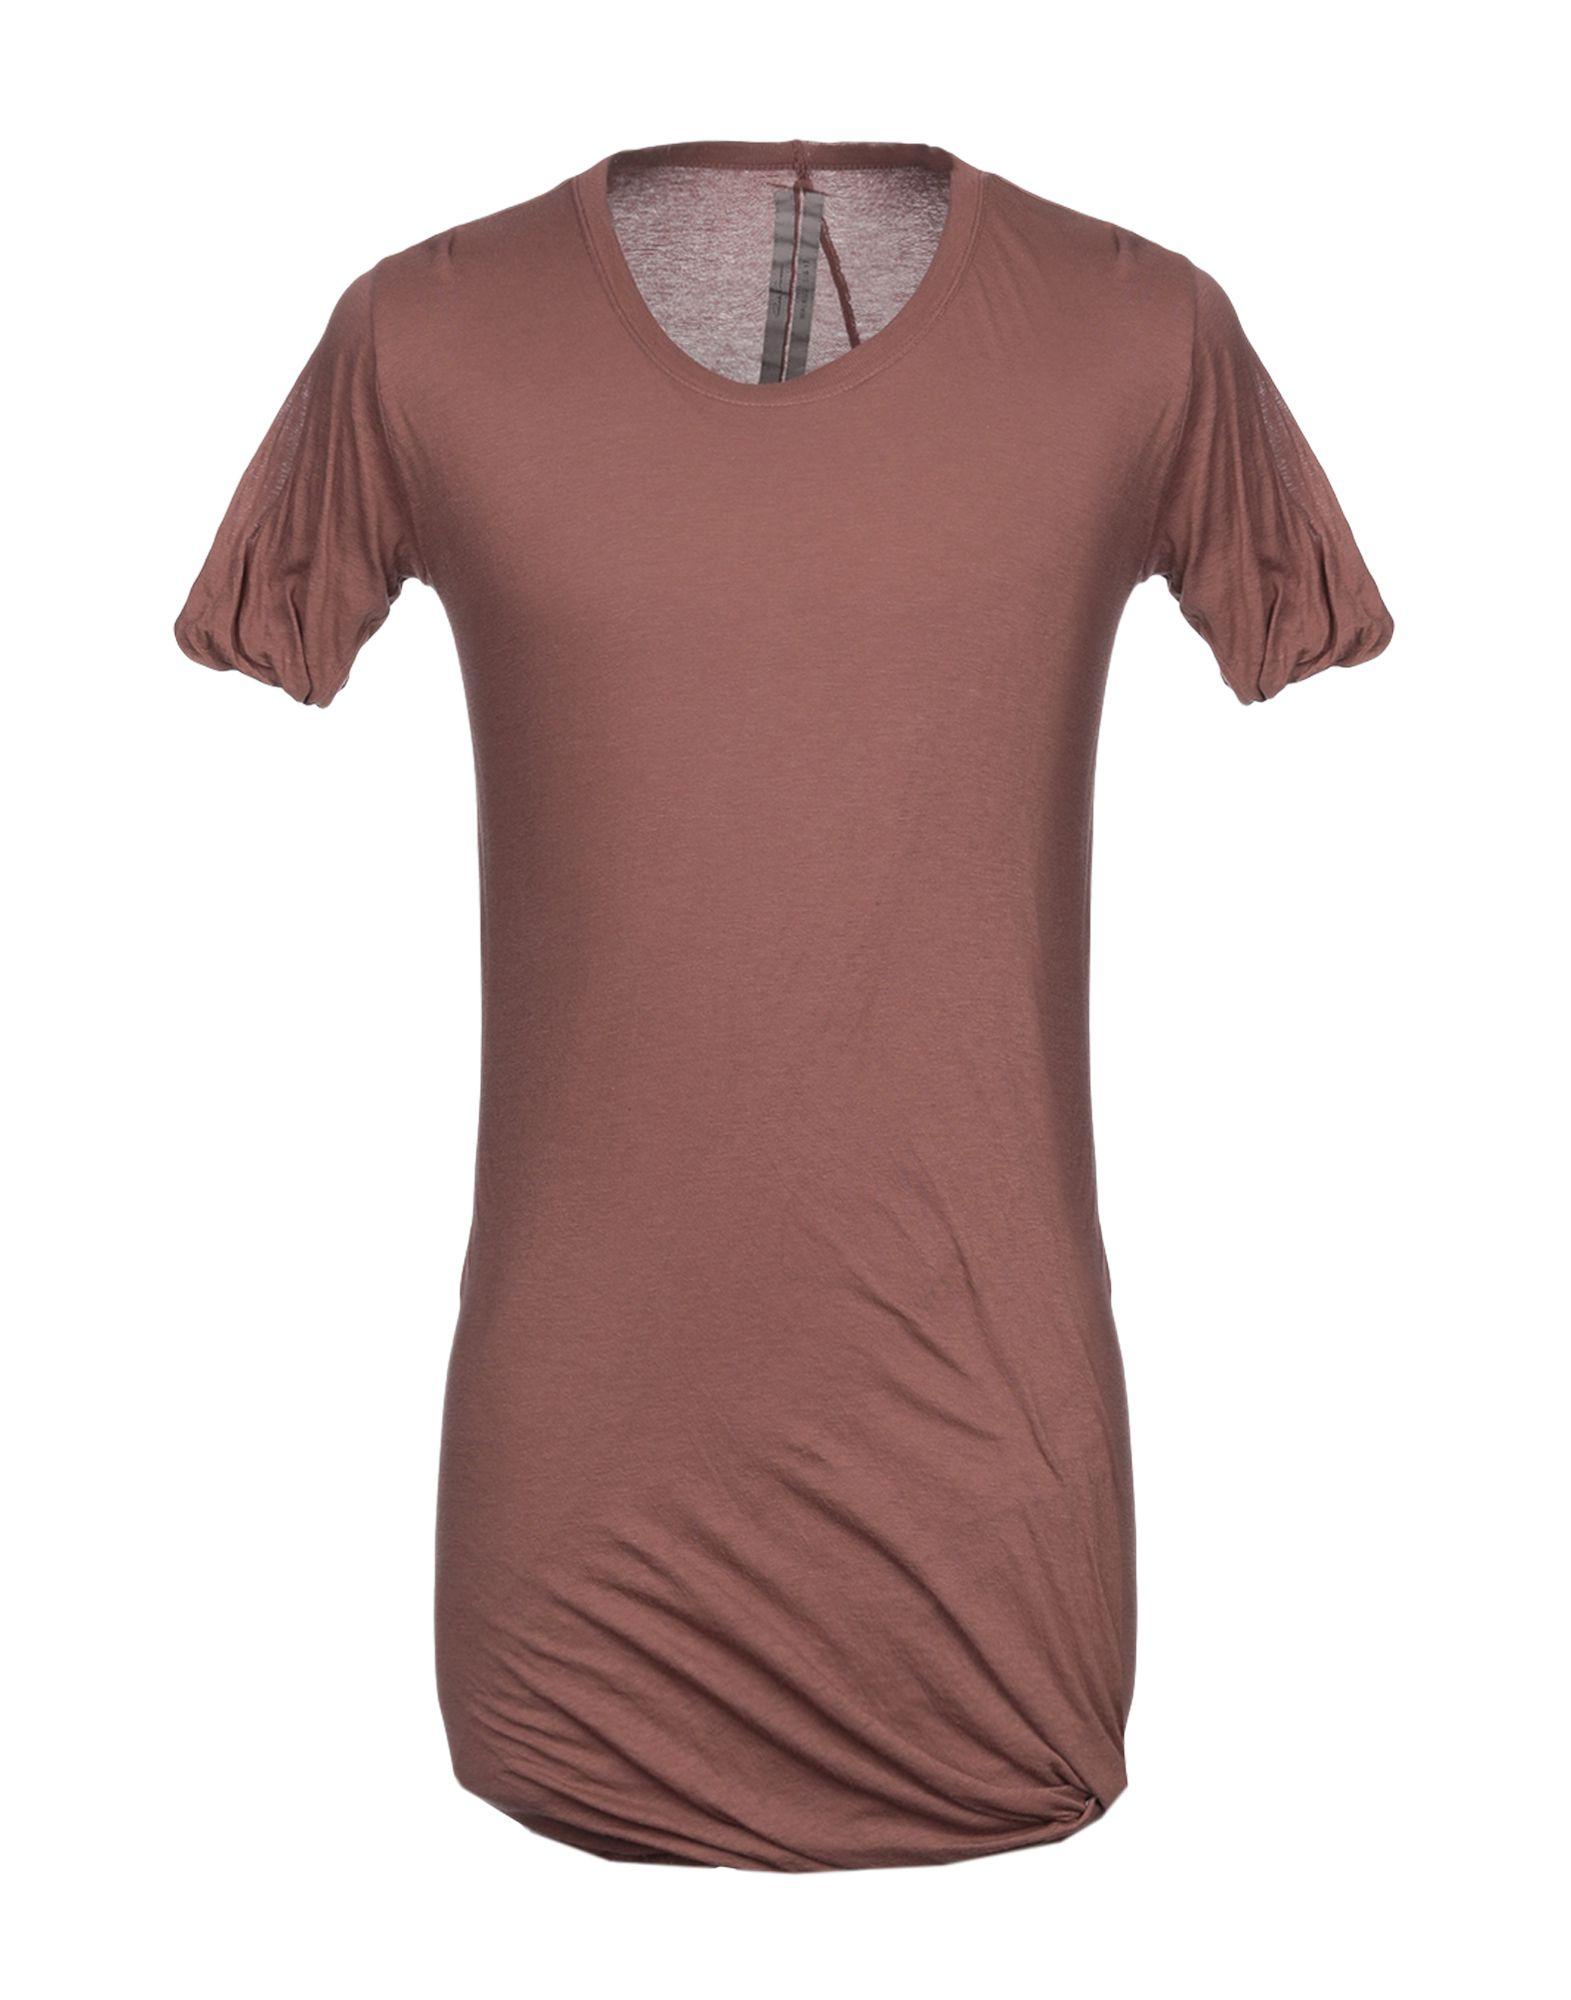 T-Shirt Rick Owens herren - 12079455OJ